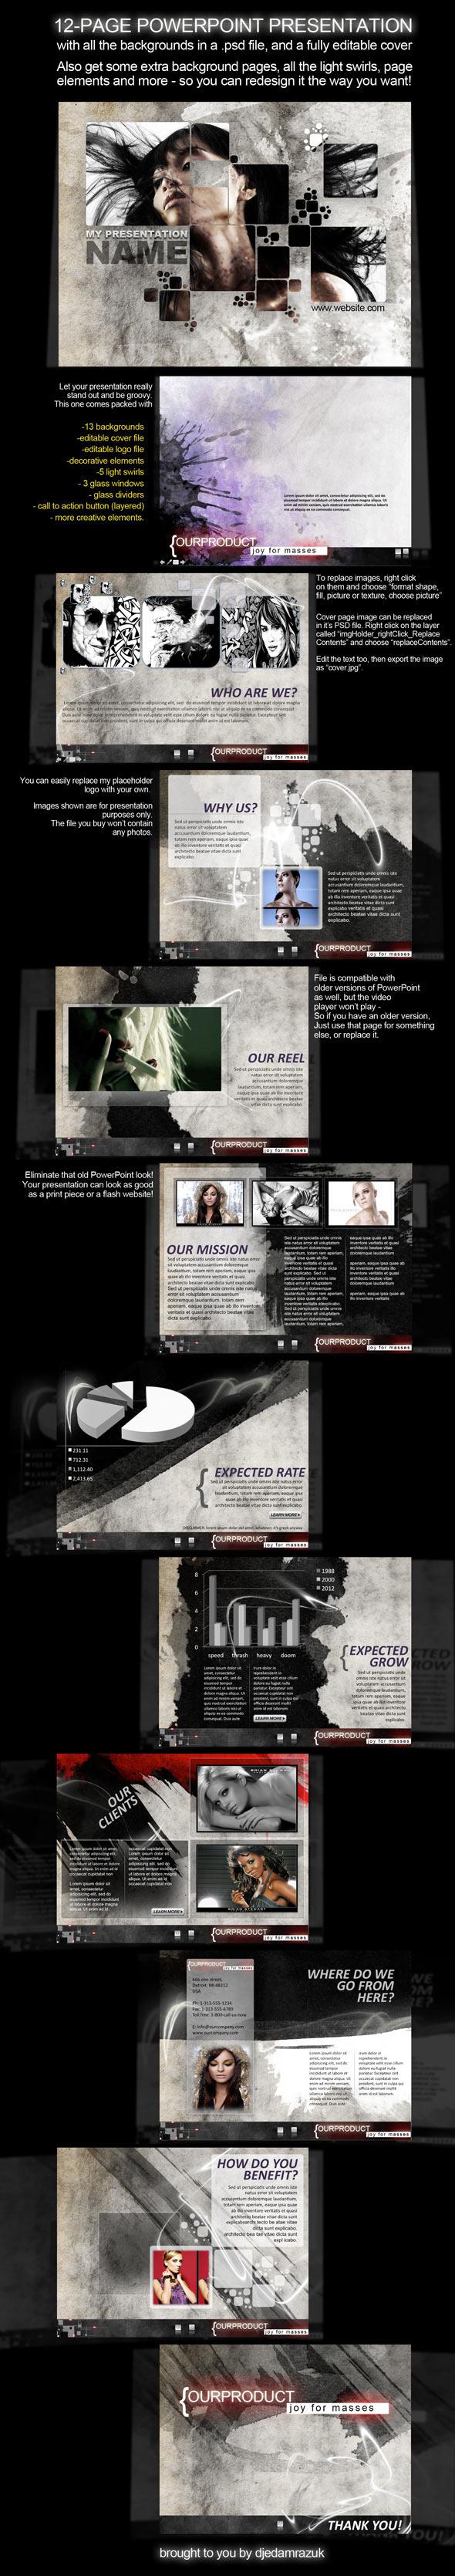 12-Page PowerPoint Presentation - Splash - Creative PowerPoint Templates